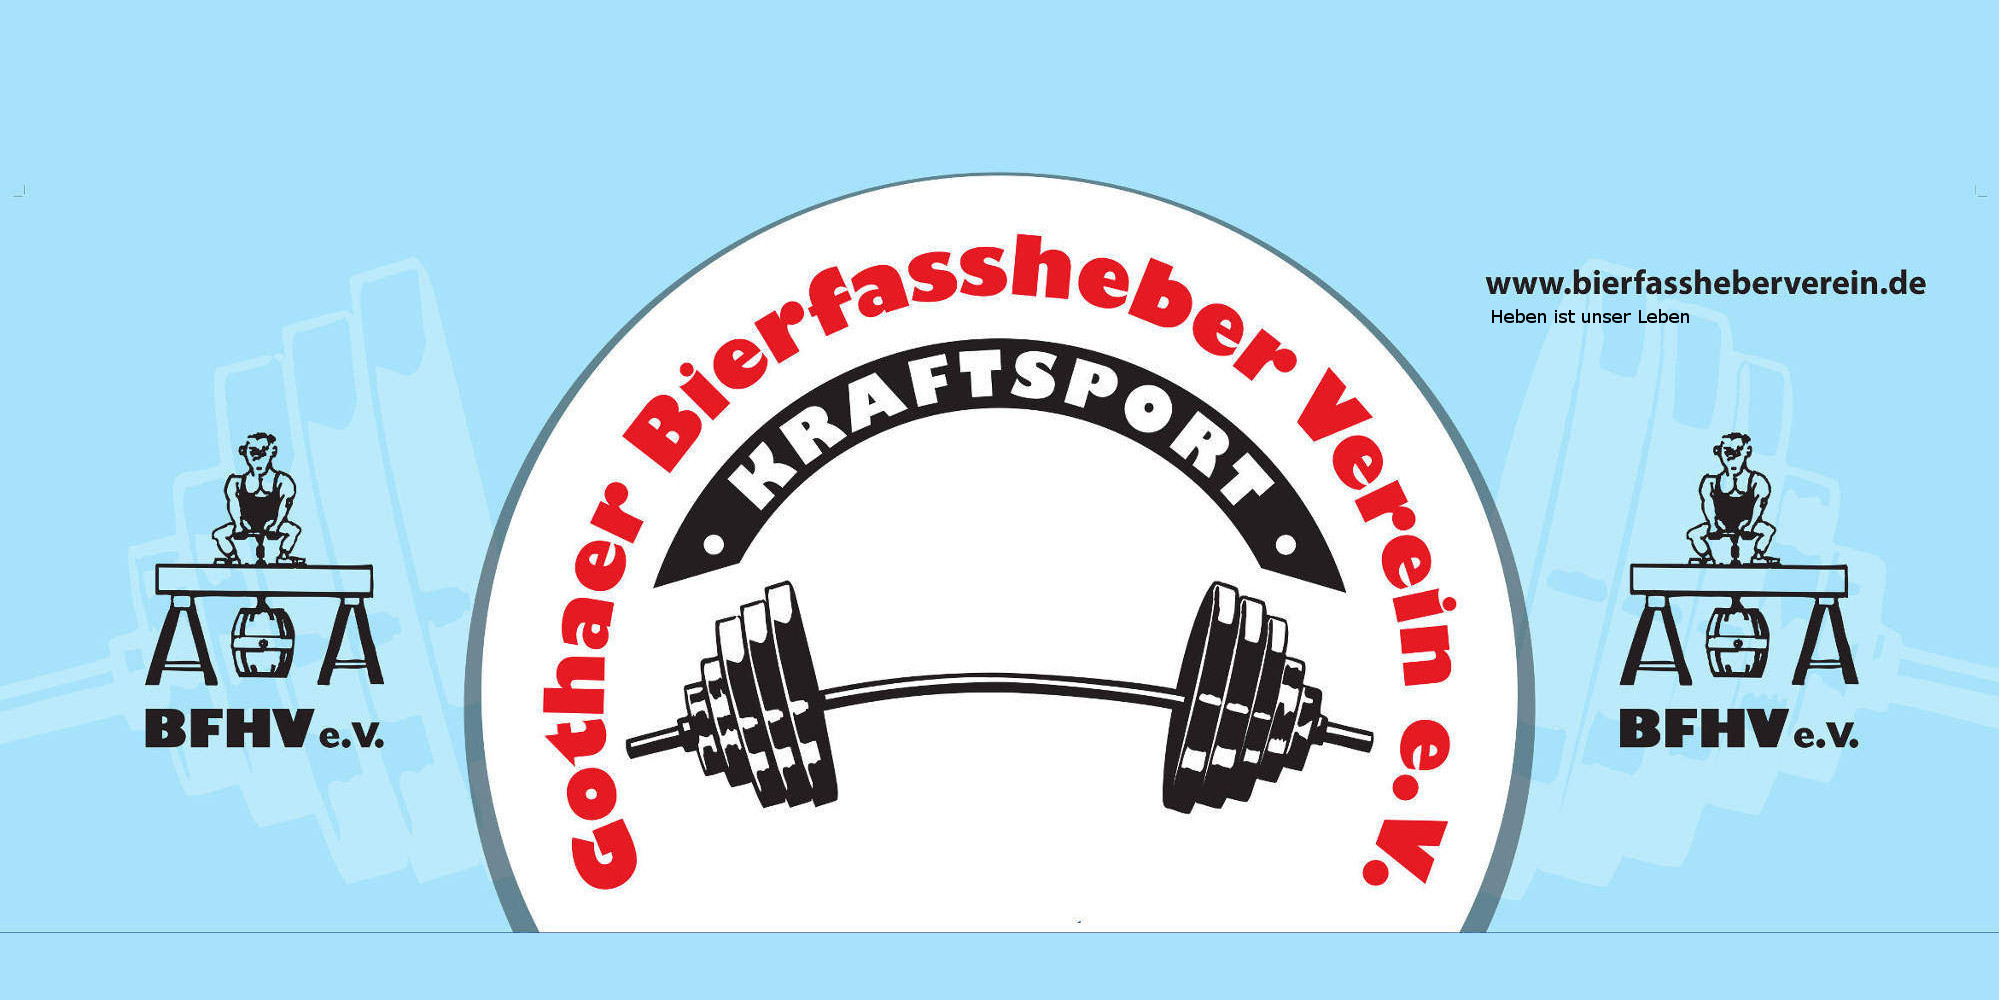 Gothaer Bierfassheberverein e.V.